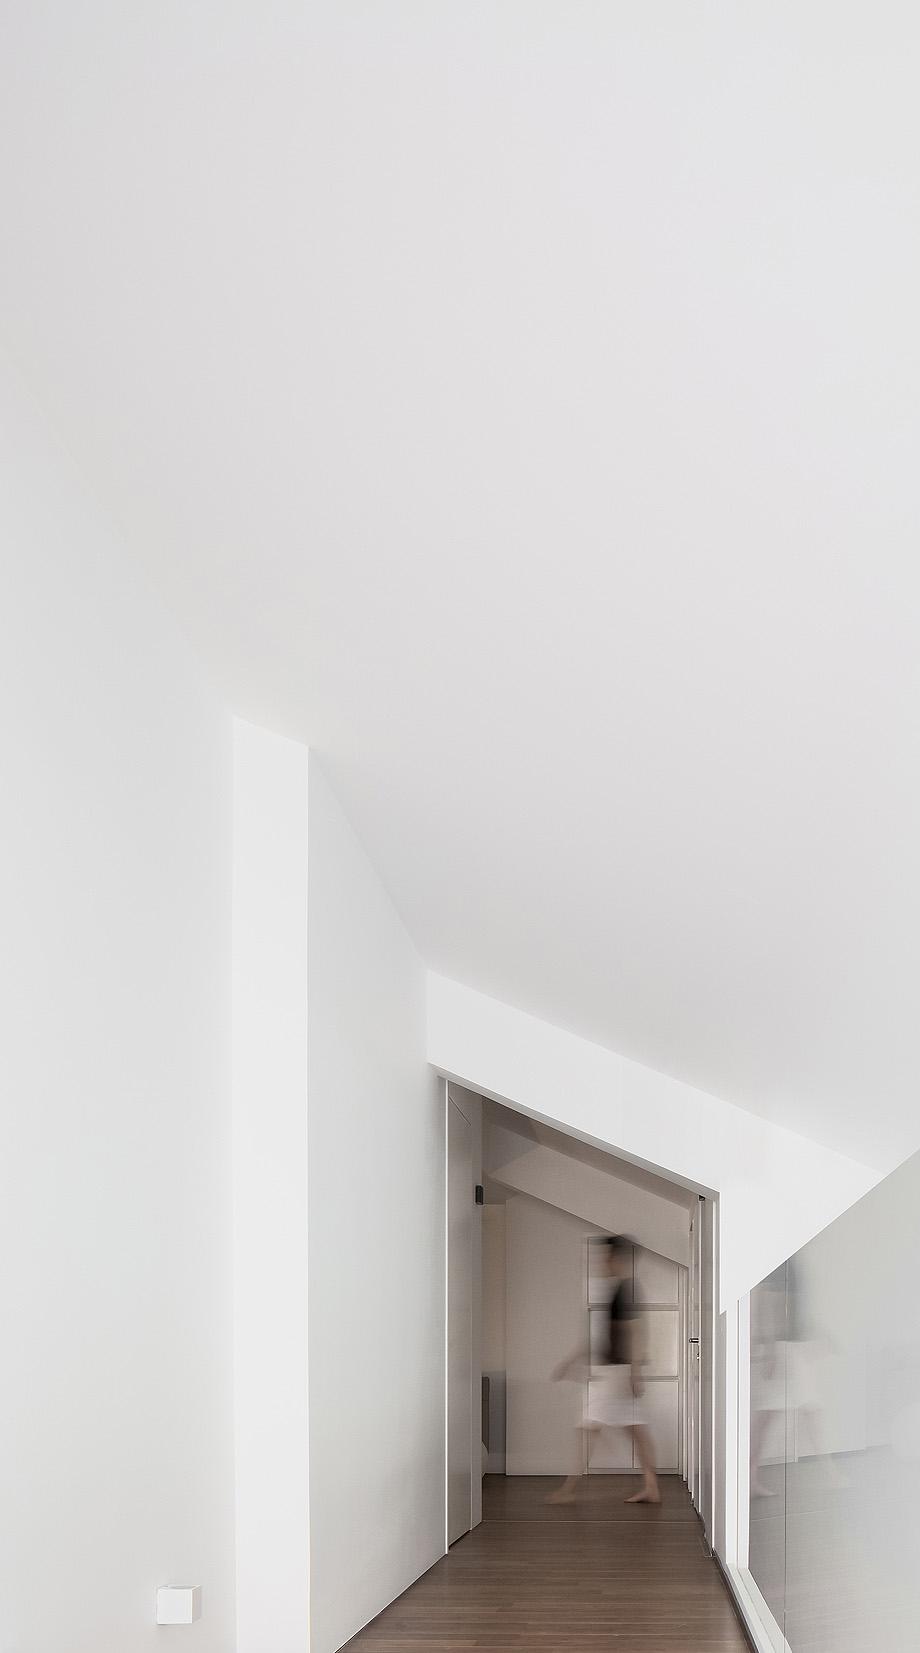 apartamento en shantou de ad architecture - foto ouyang yun (17)